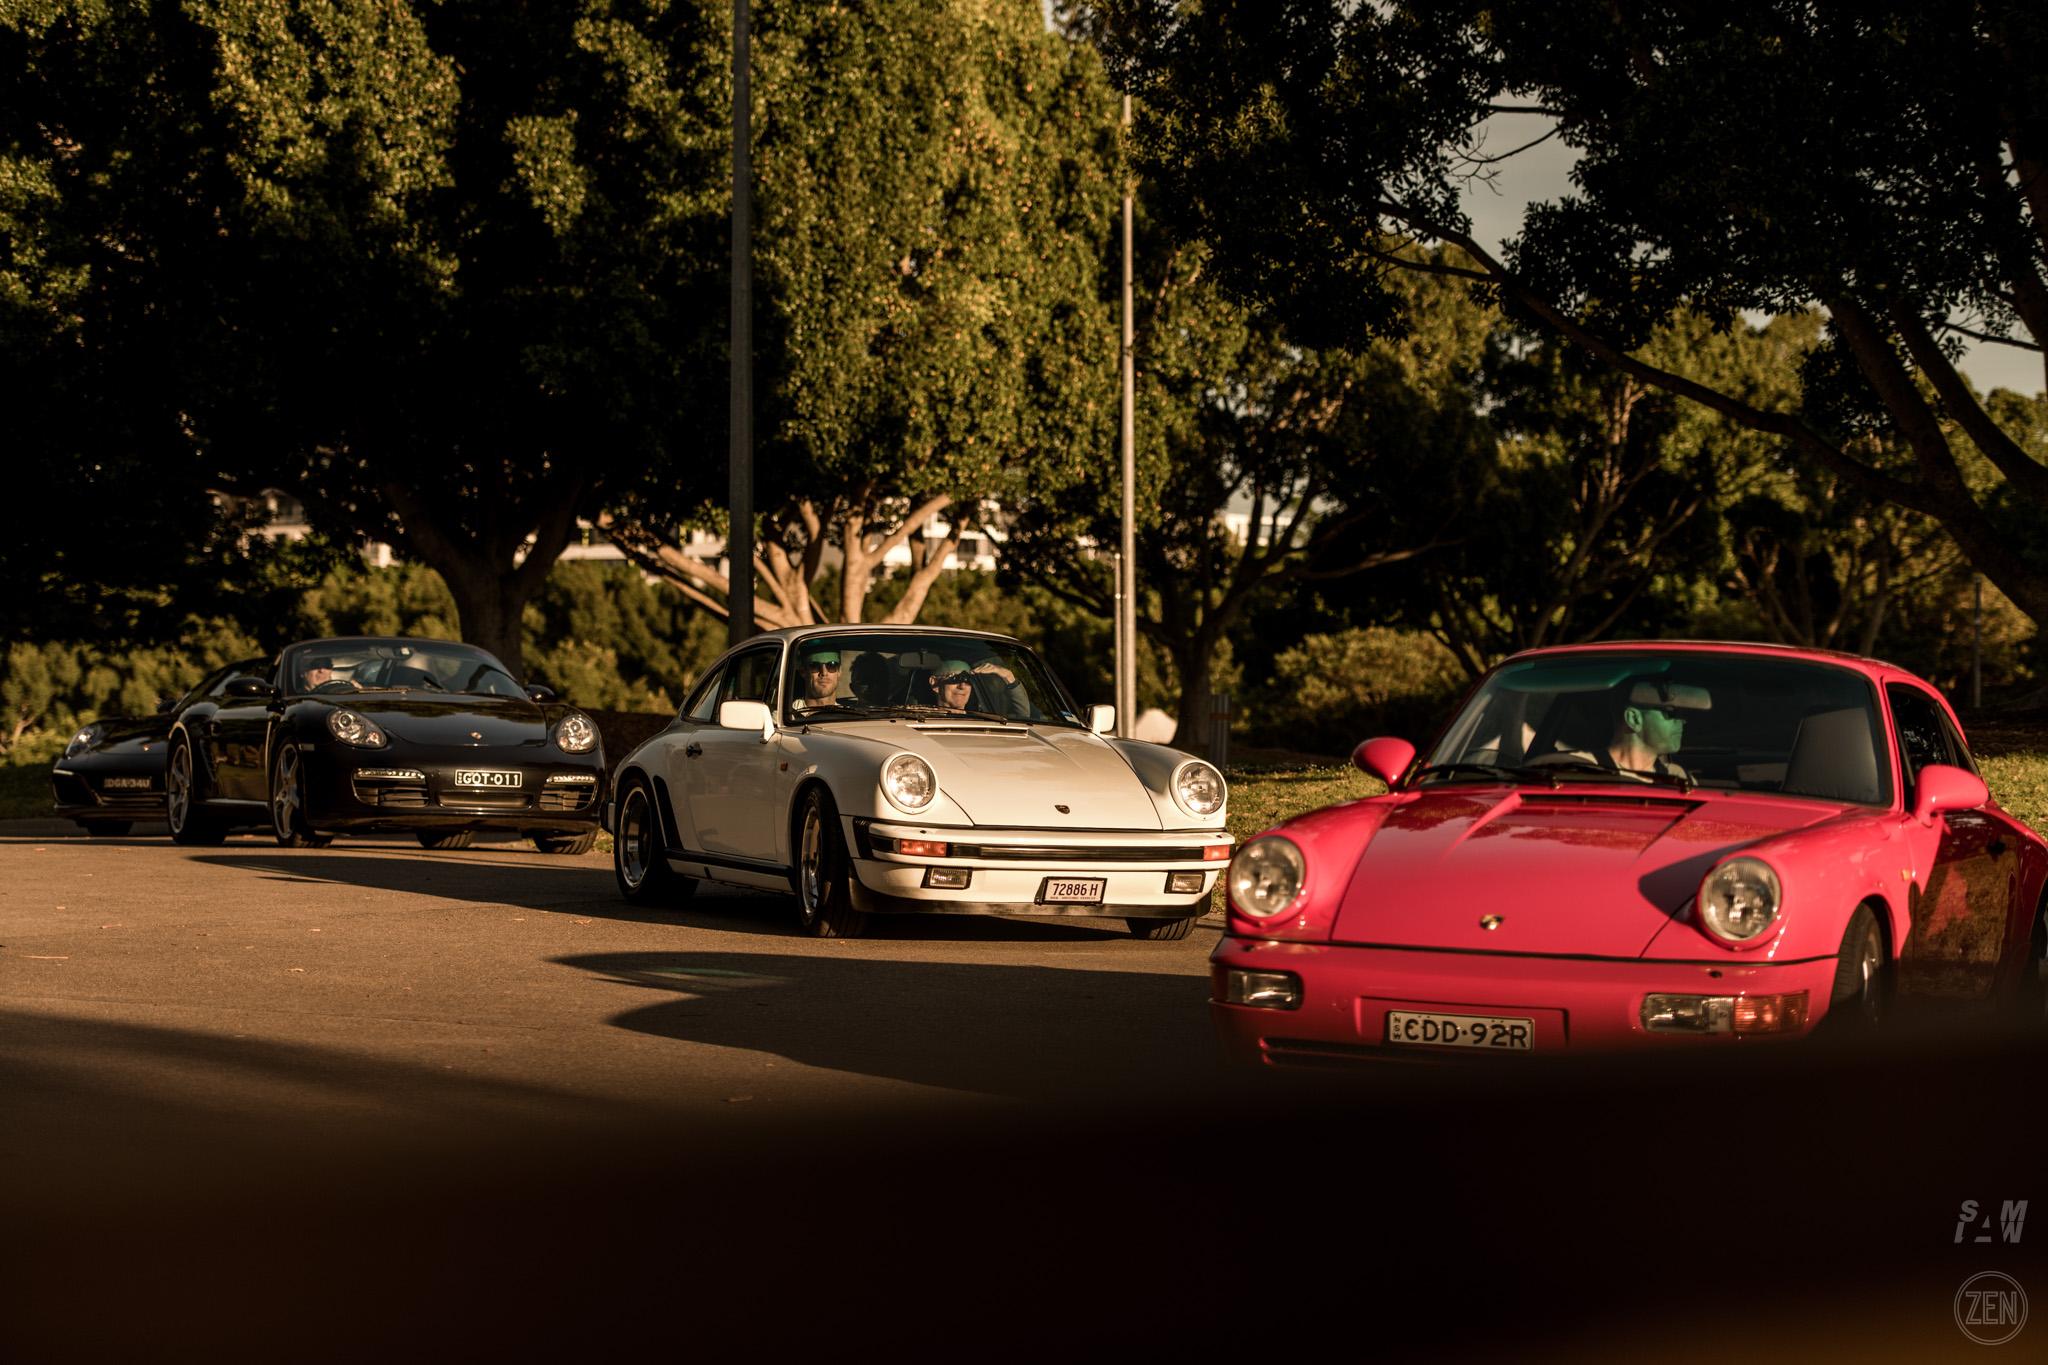 2019-10-27 - Autohaus Porsches & Coffee 045